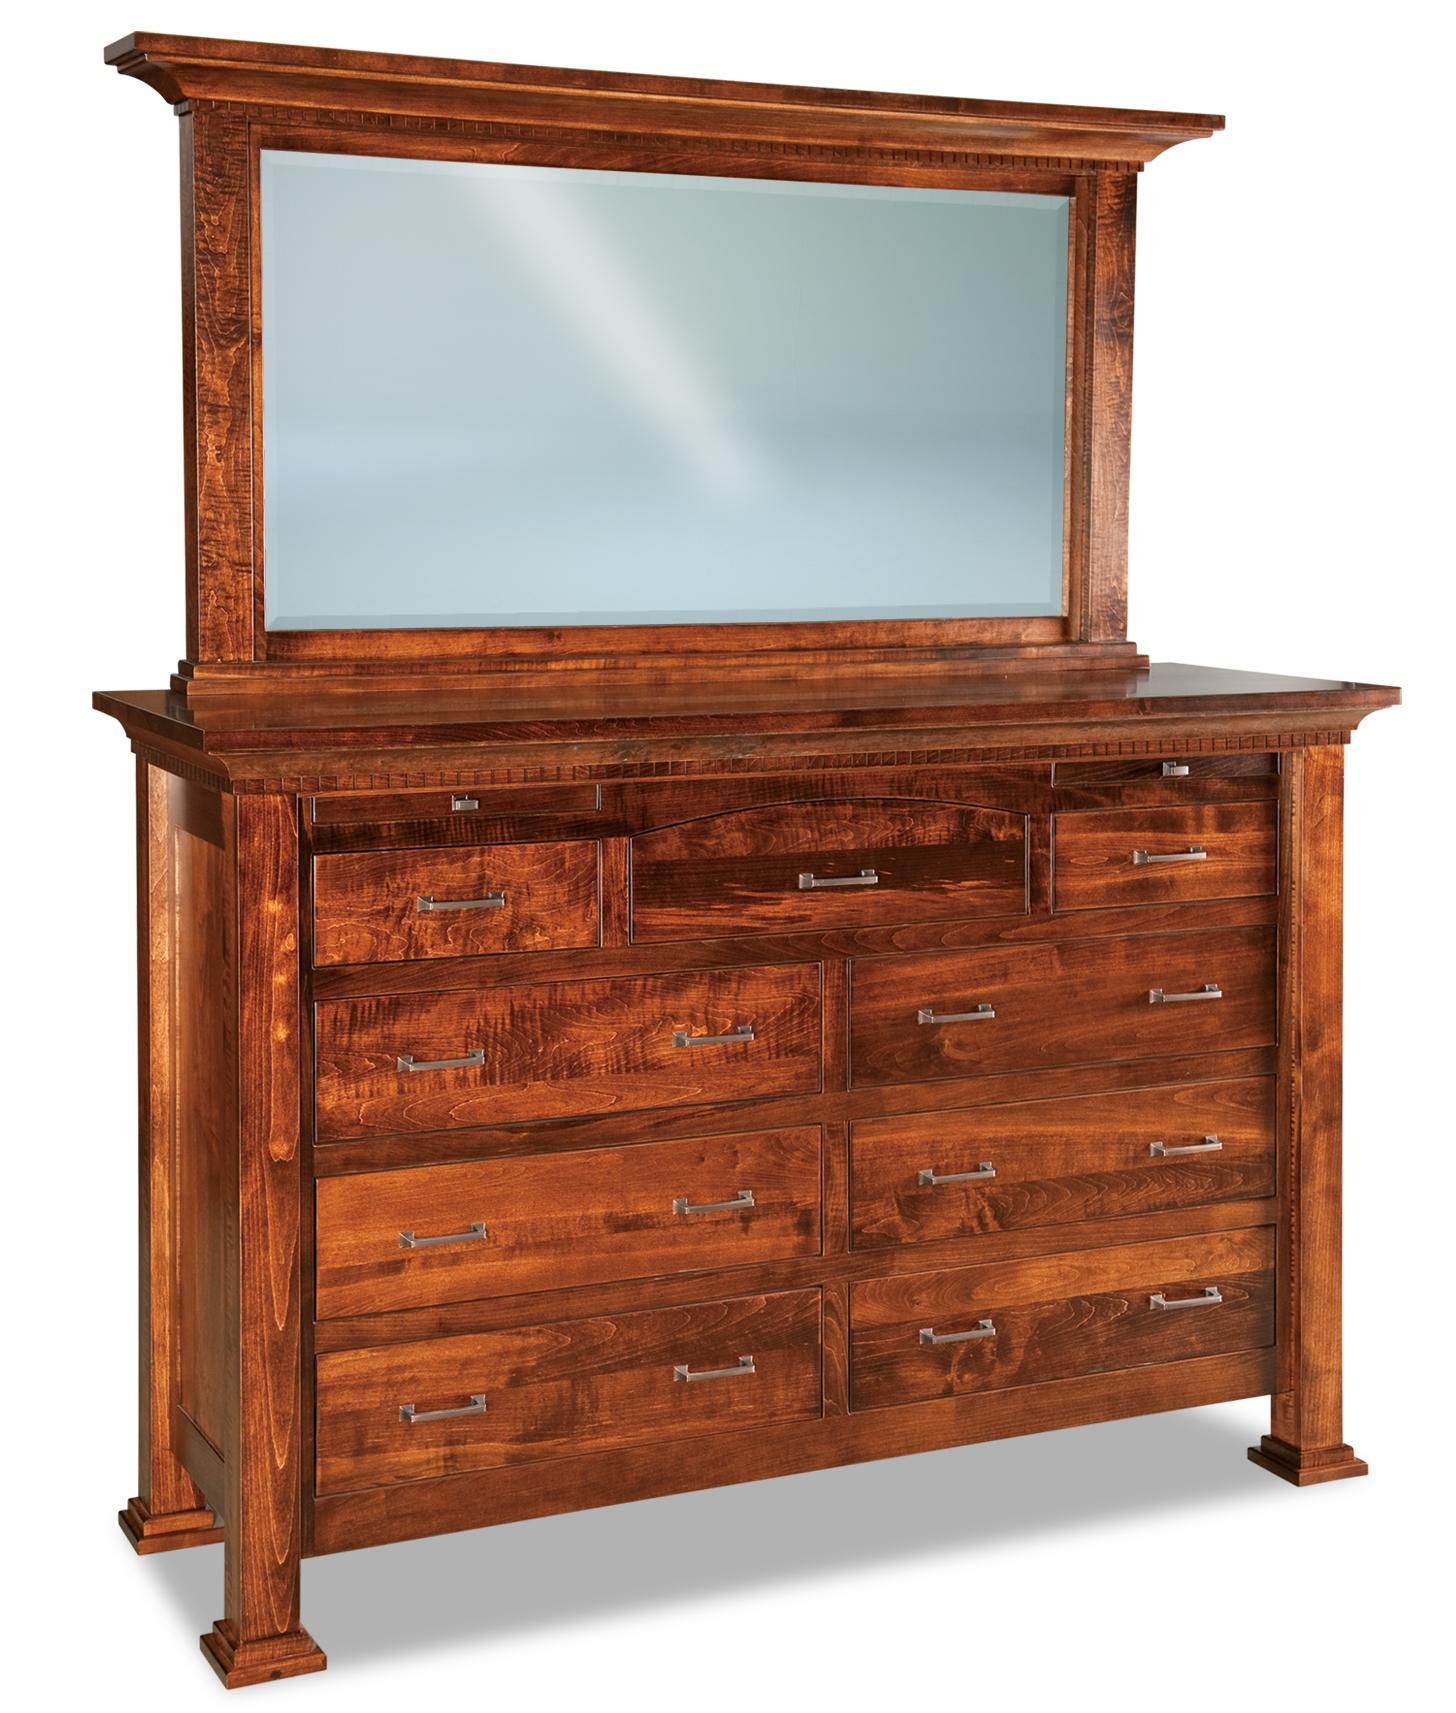 Empire 9 Drawer Dressers Amish Furniture Store Mankato Mn